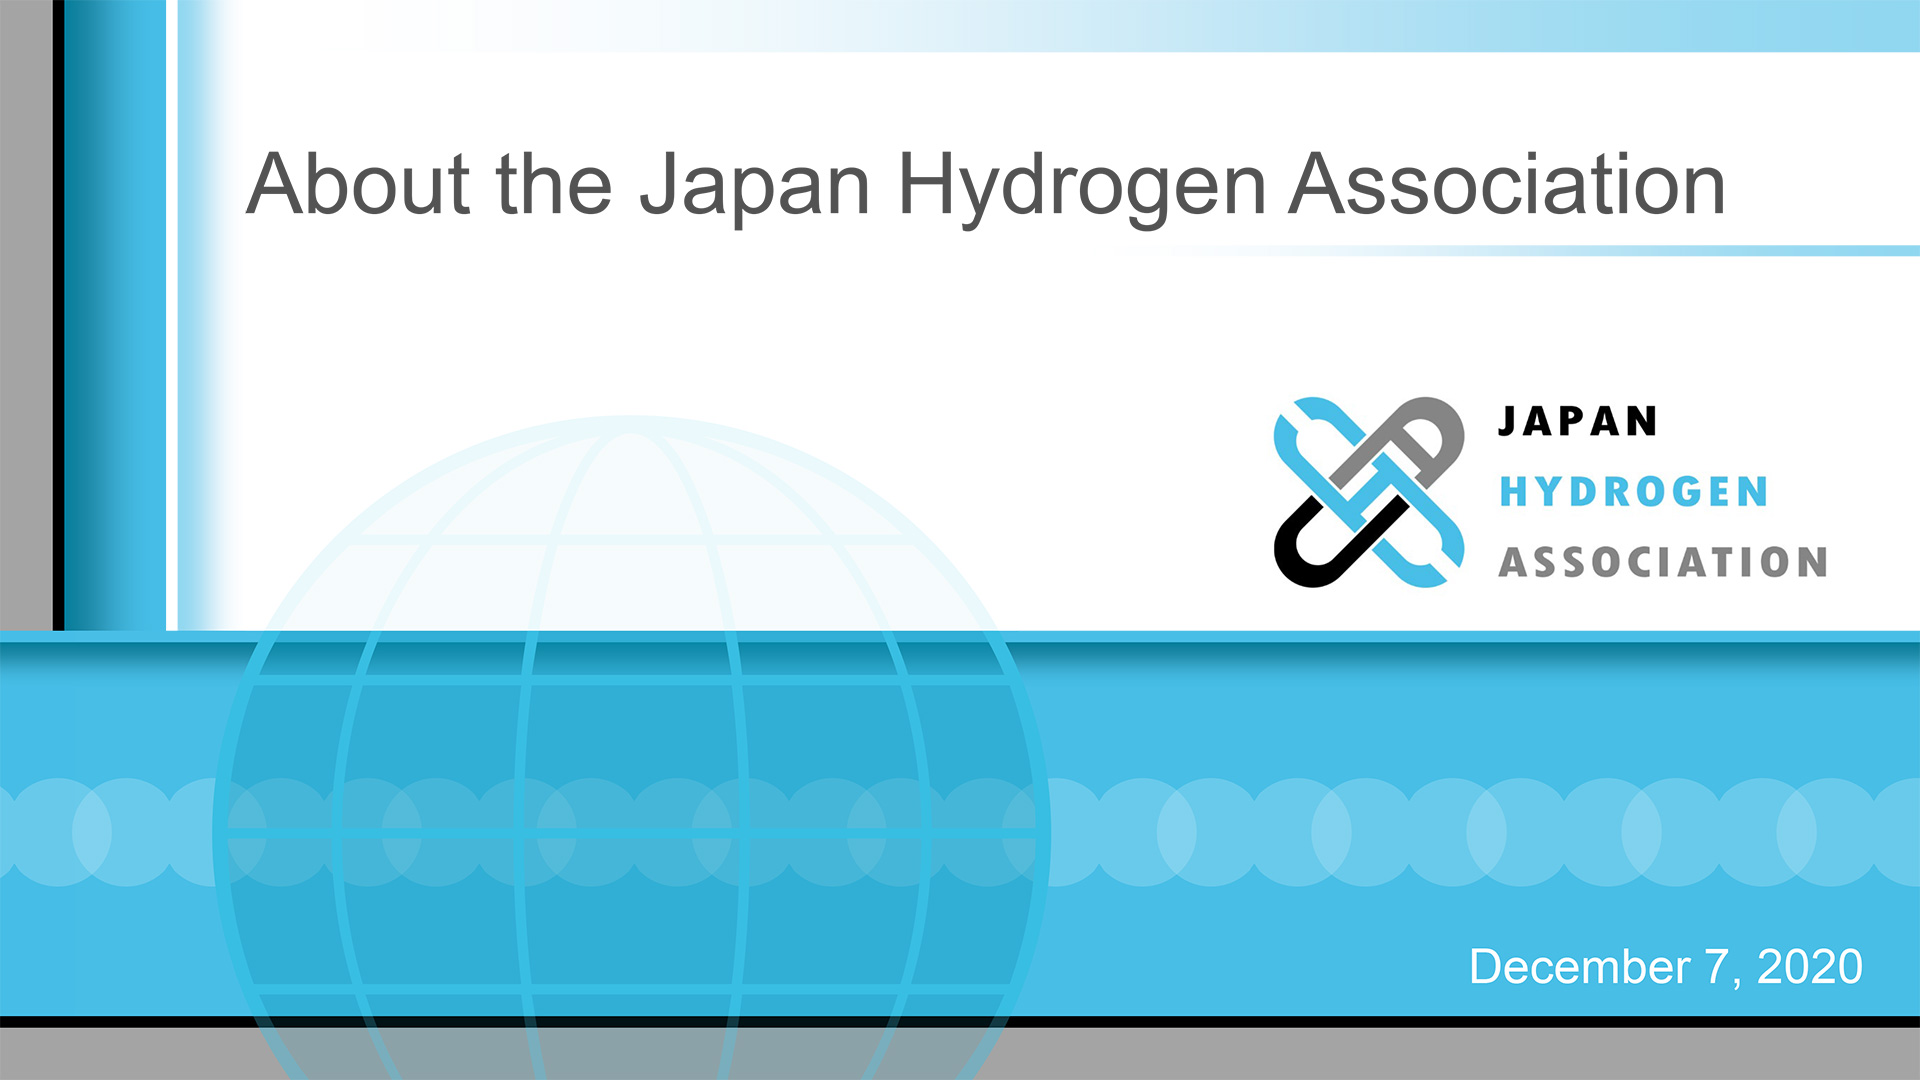 About the Japan Hydrogen Association